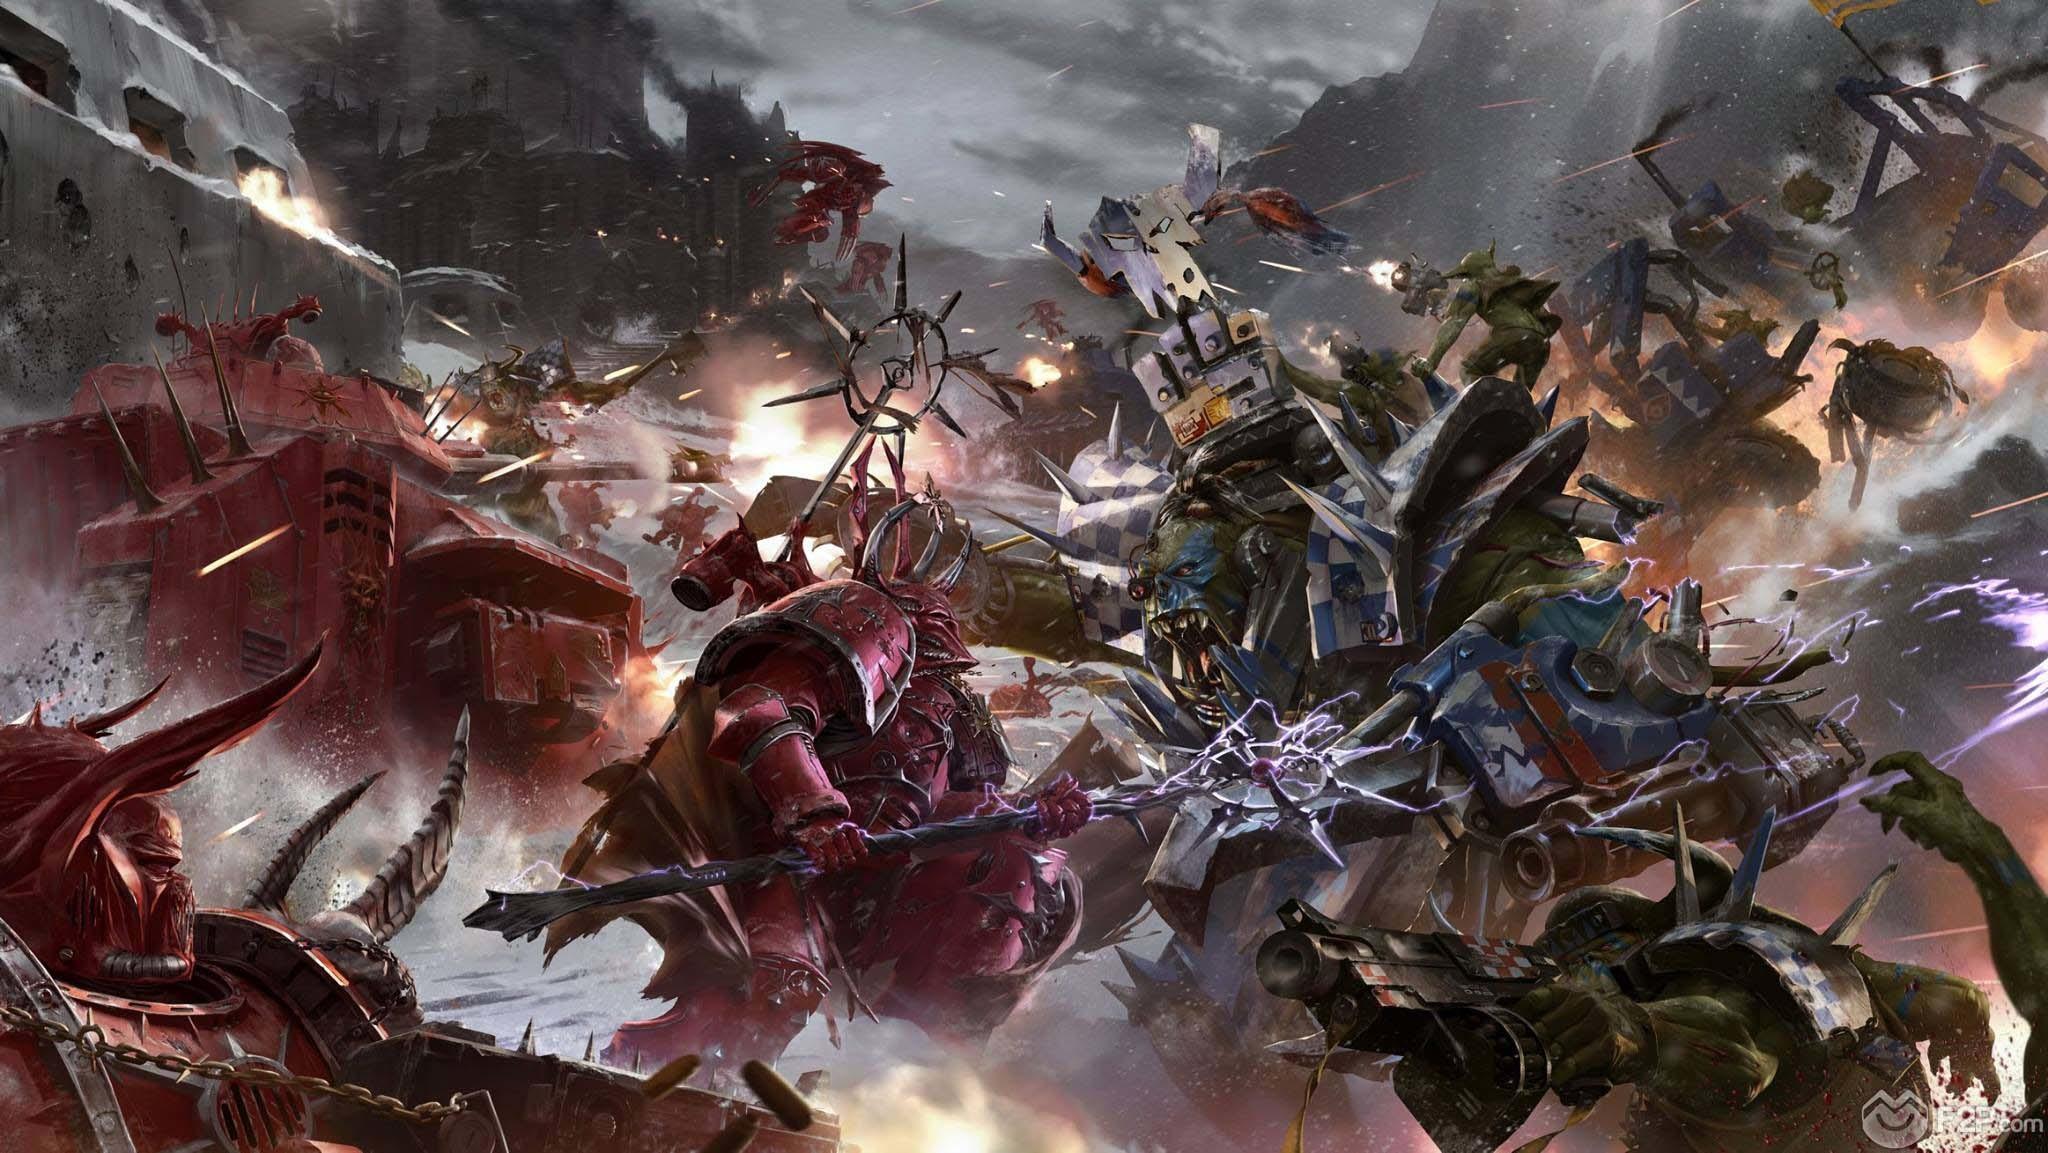 Warhammer 40,000 Eternal Crusade screenshot 1 …